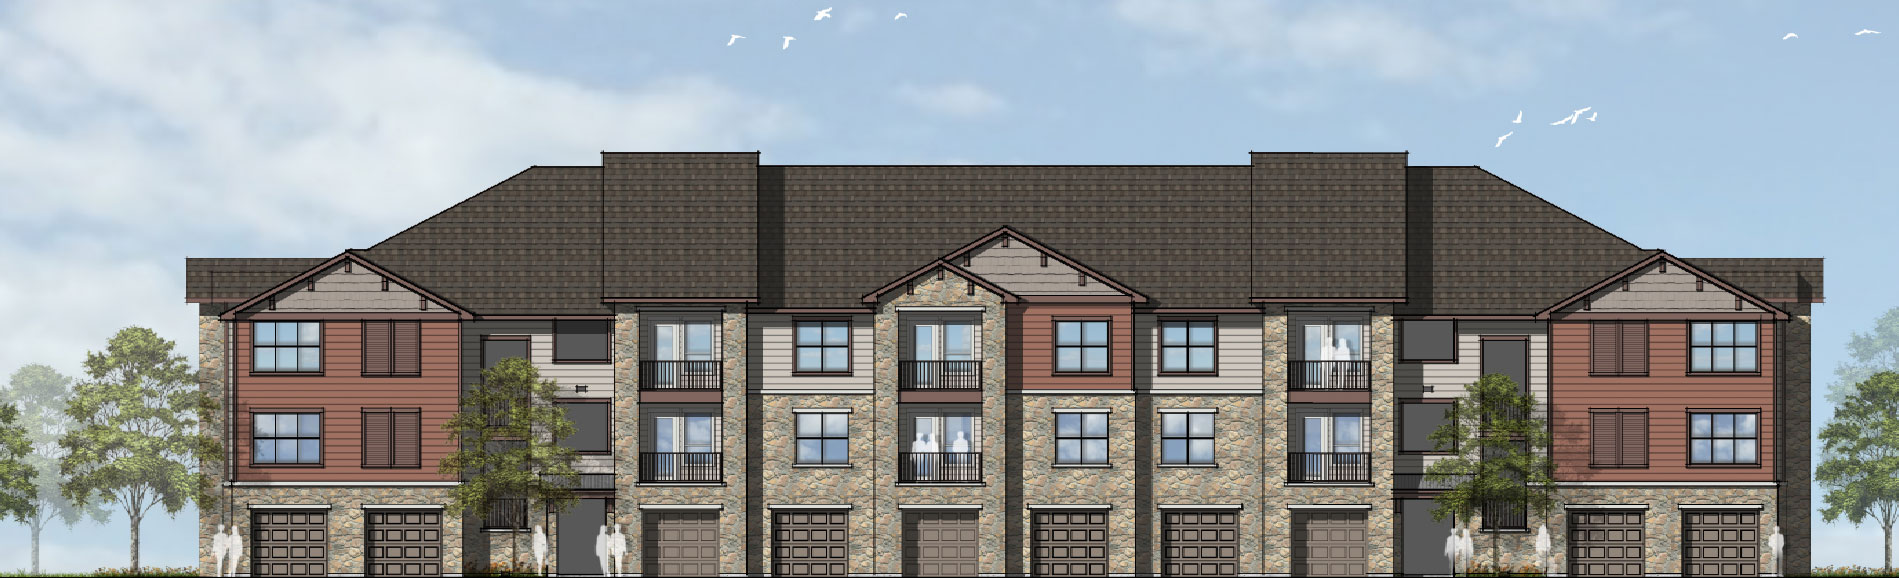 Bluehawk-Apartments-Rendering